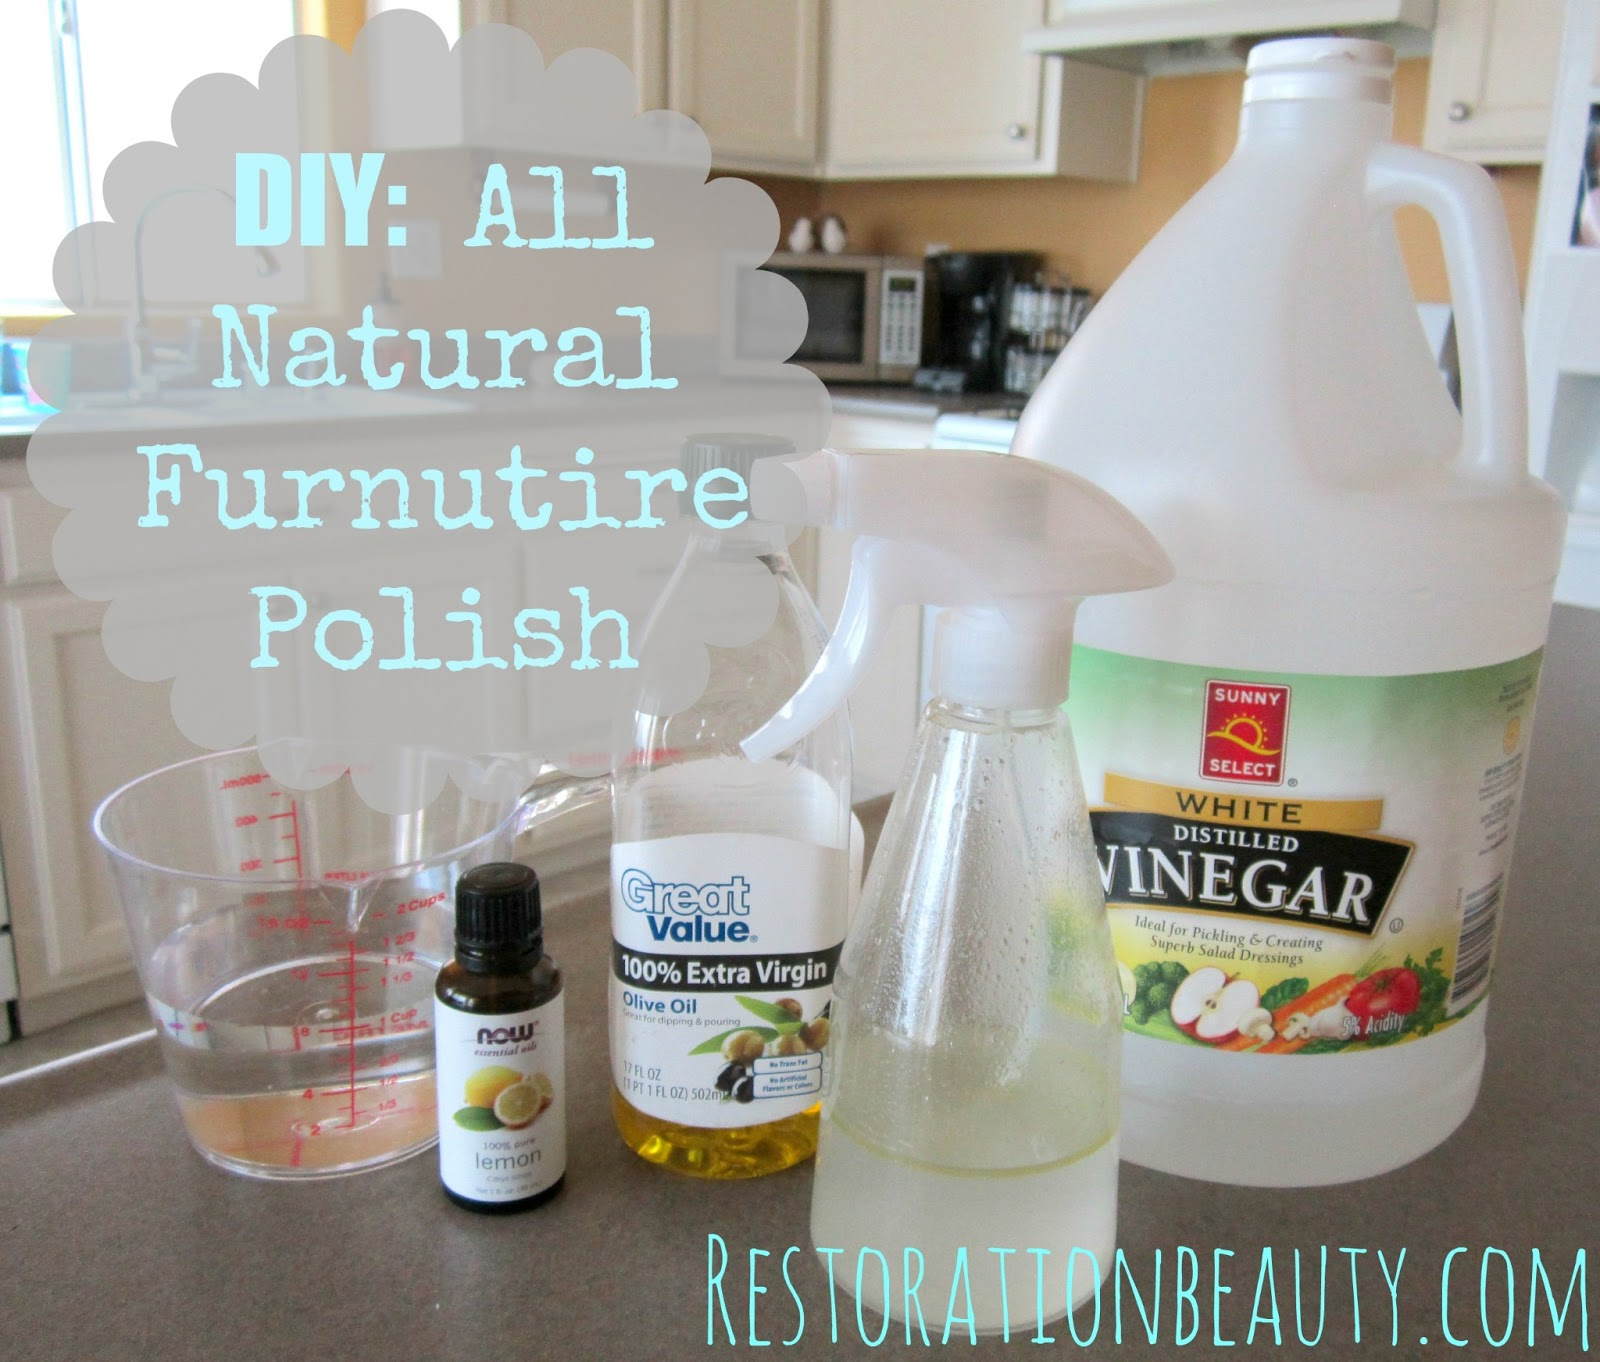 DIY  All Natural Furniture Polish. Restoration Beauty  DIY  All Natural Furniture Polish